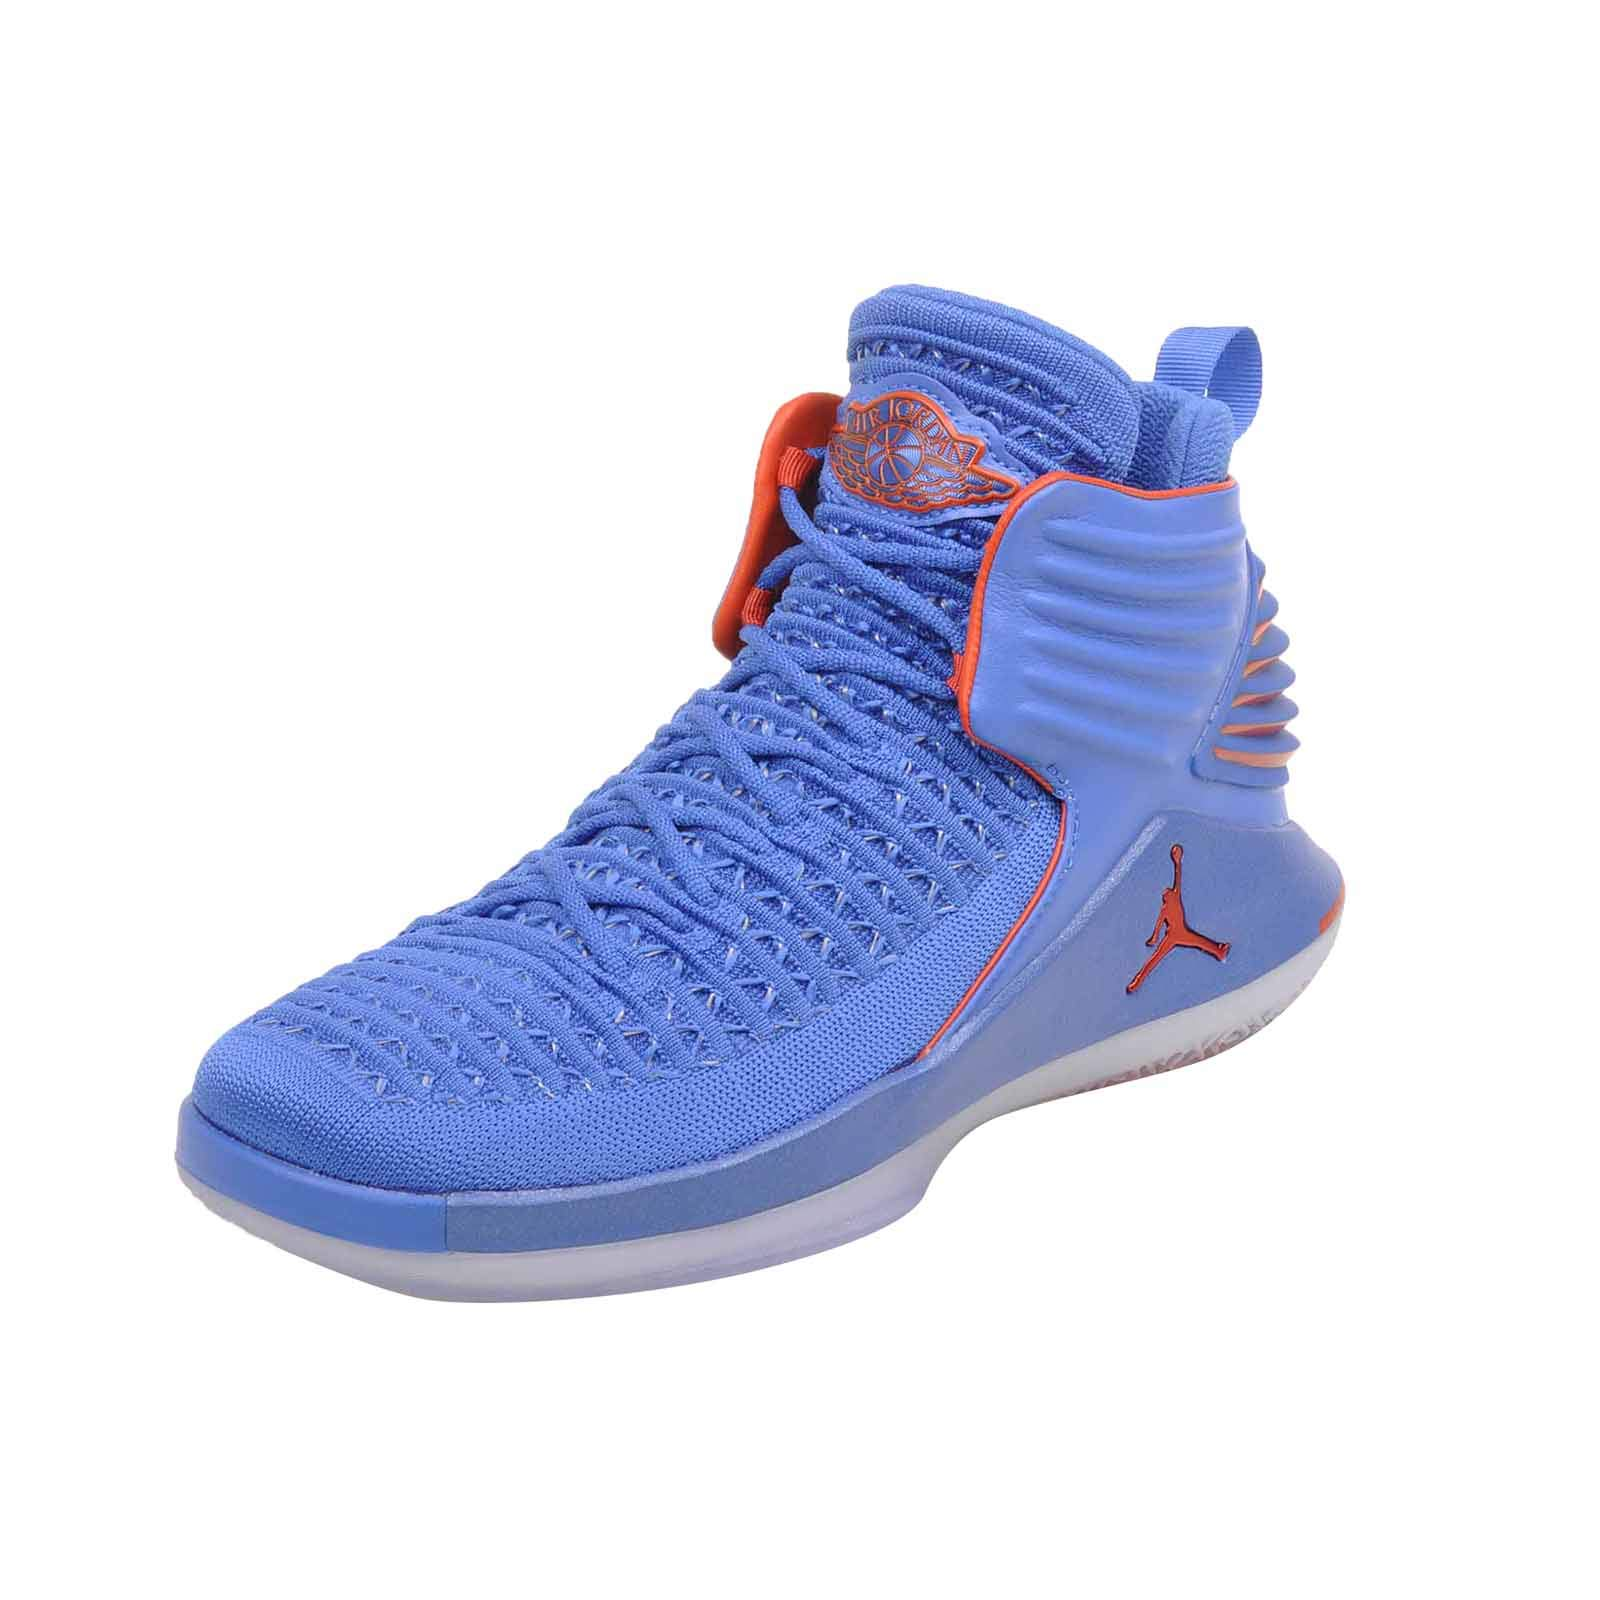 san francisco f3628 089f6 NIKE Youth Air Jordan 32 BG AA1254 400 Blue Orange